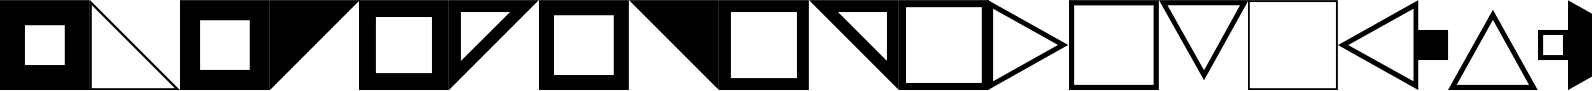 FormPattern